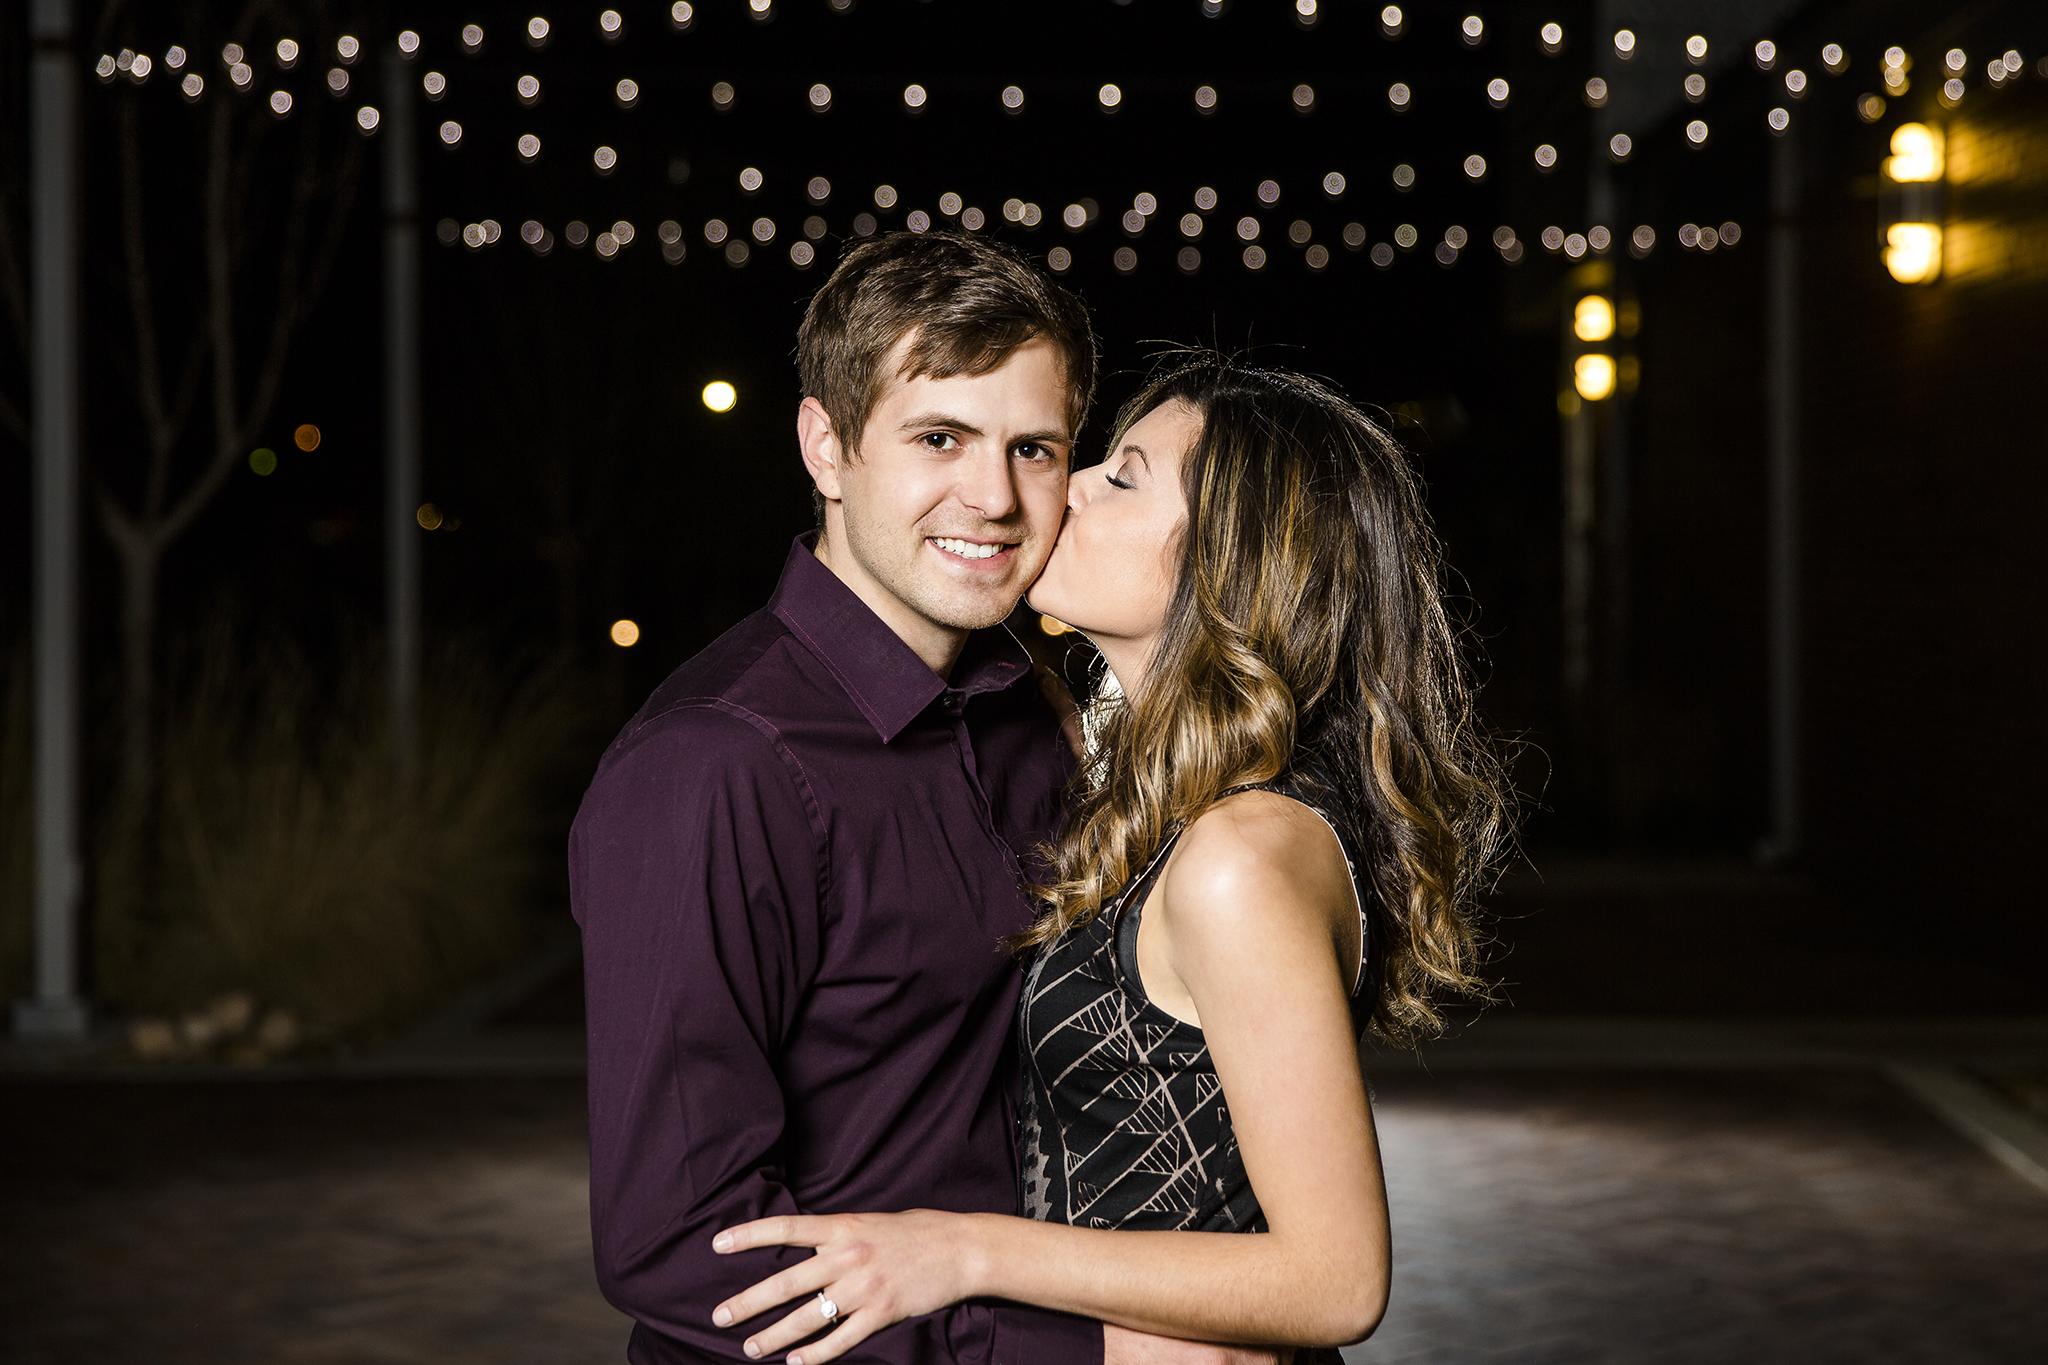 kissing, romantic, sweet engagement photos, soft light, downtown Lubbock, LHUCA building, bokeh